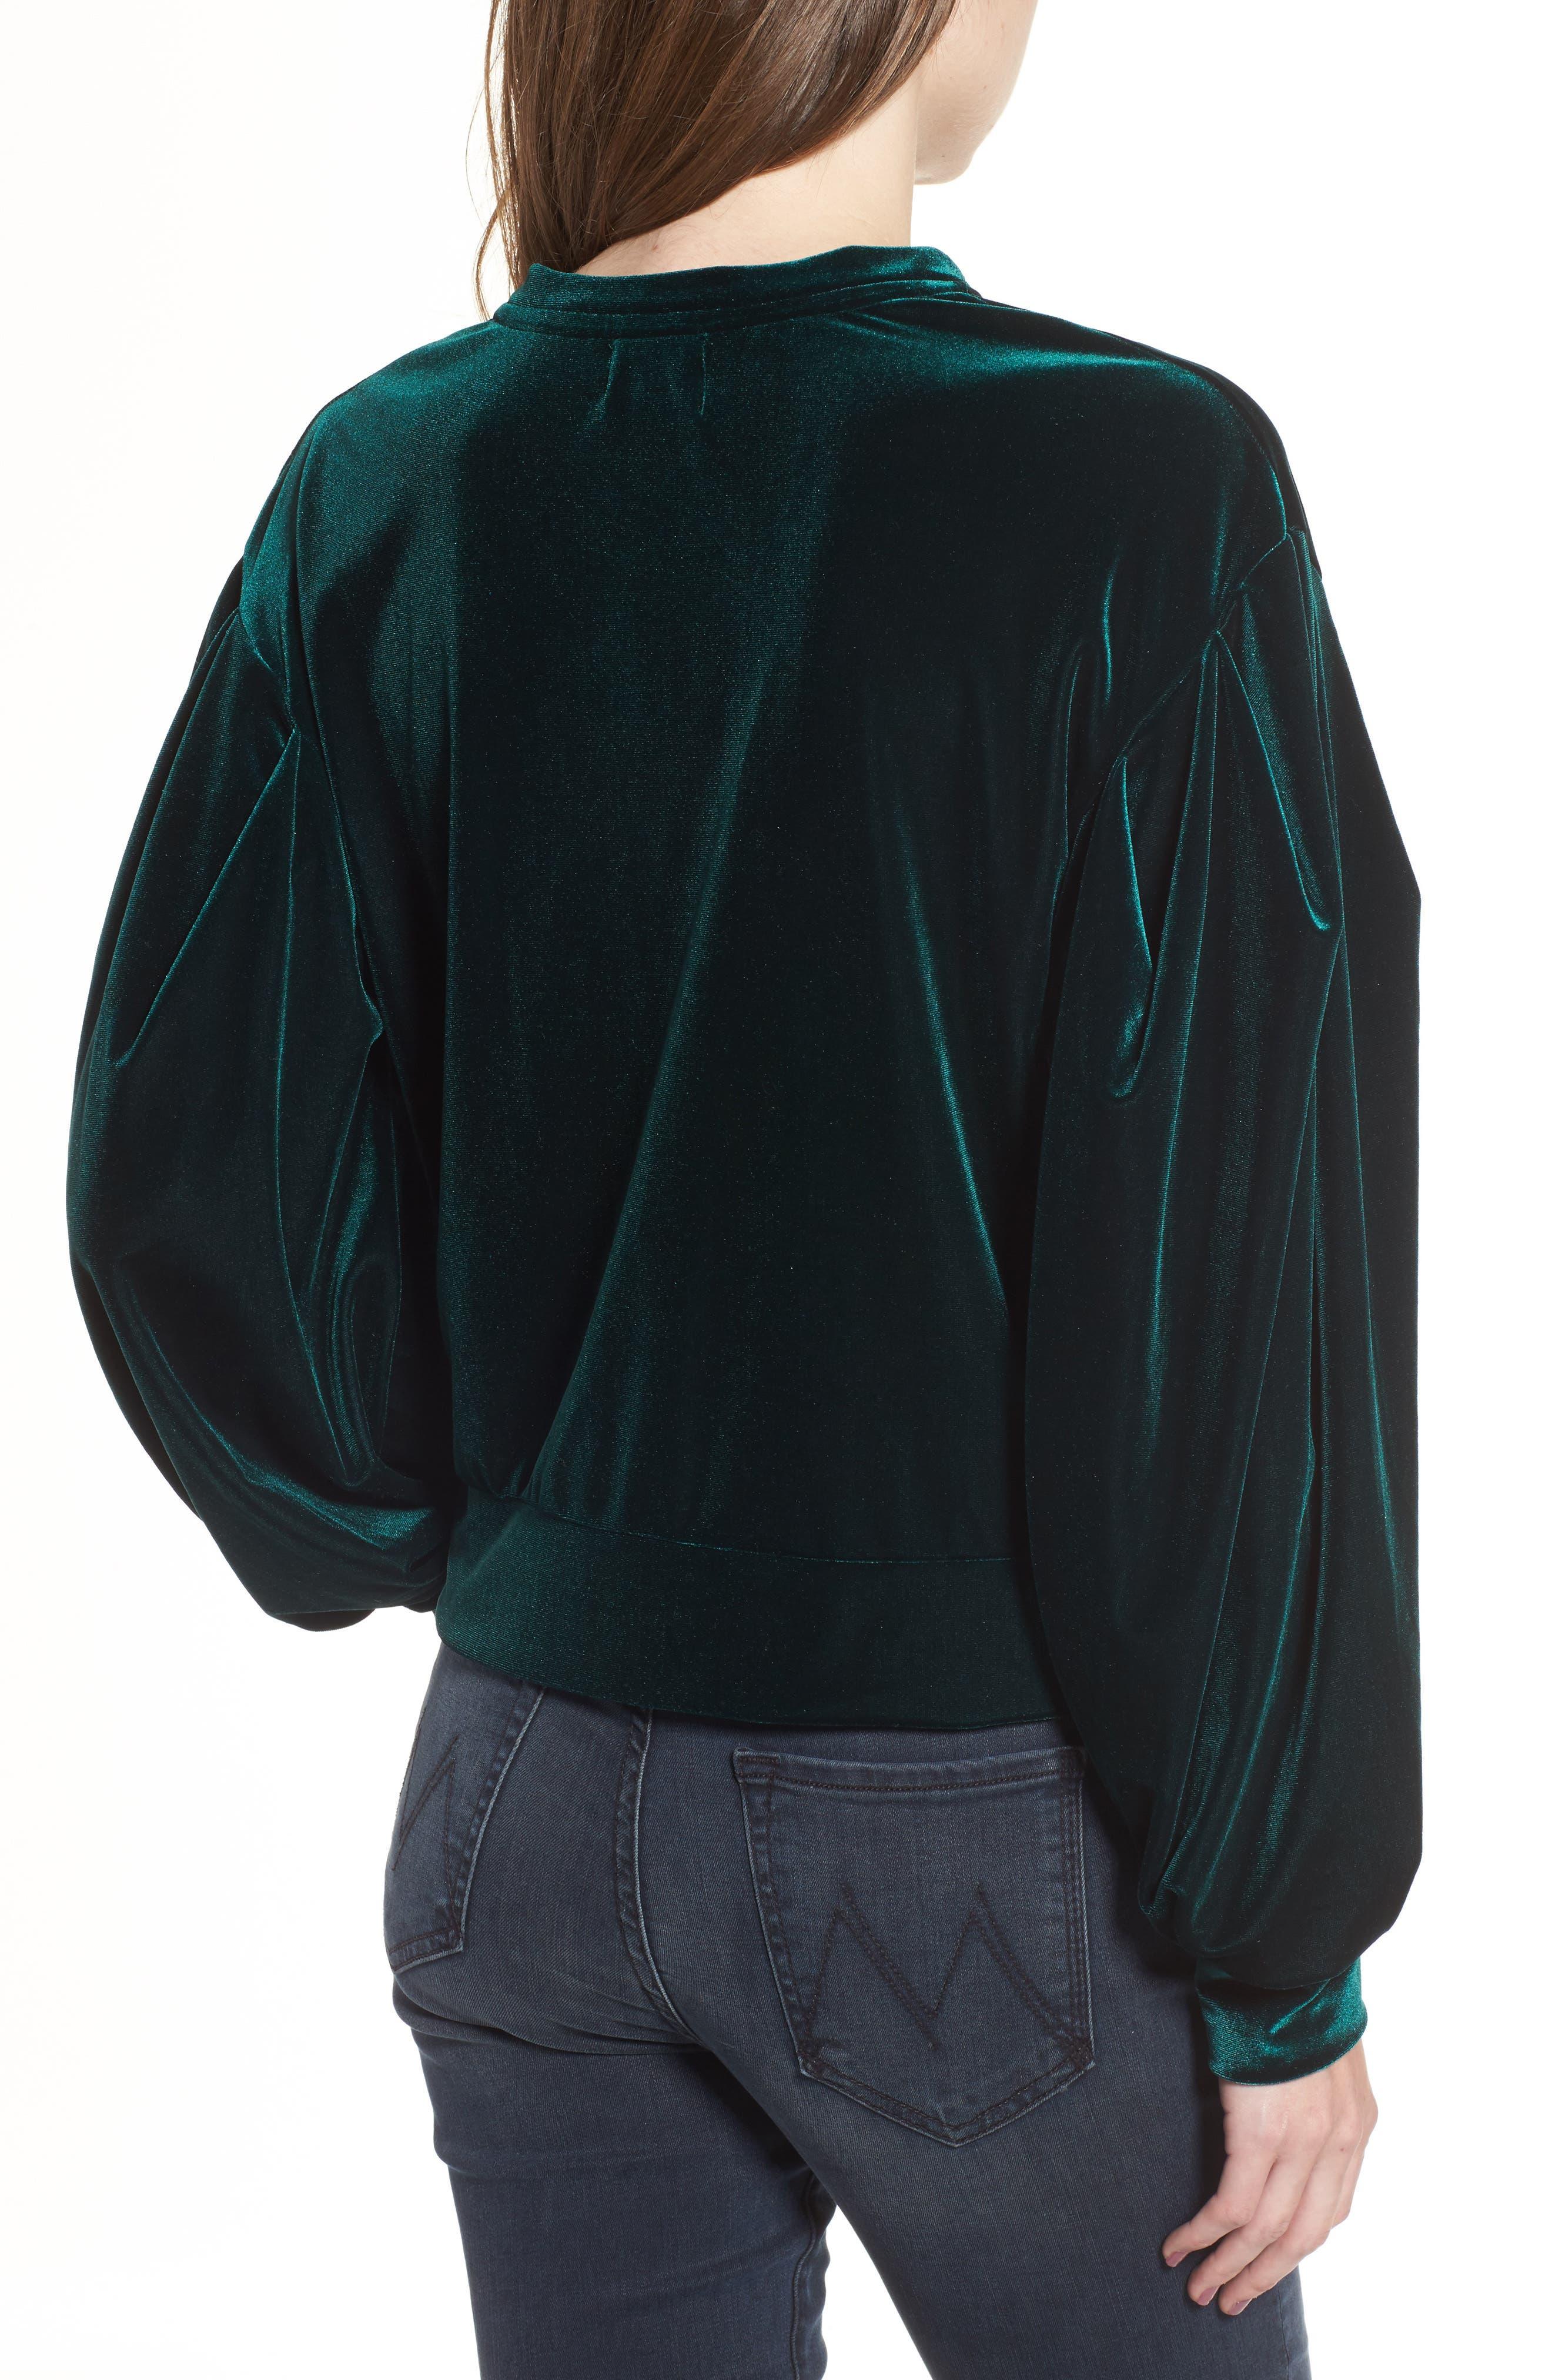 Comme Ca Velvet Sweatshirt,                             Alternate thumbnail 2, color,                             300